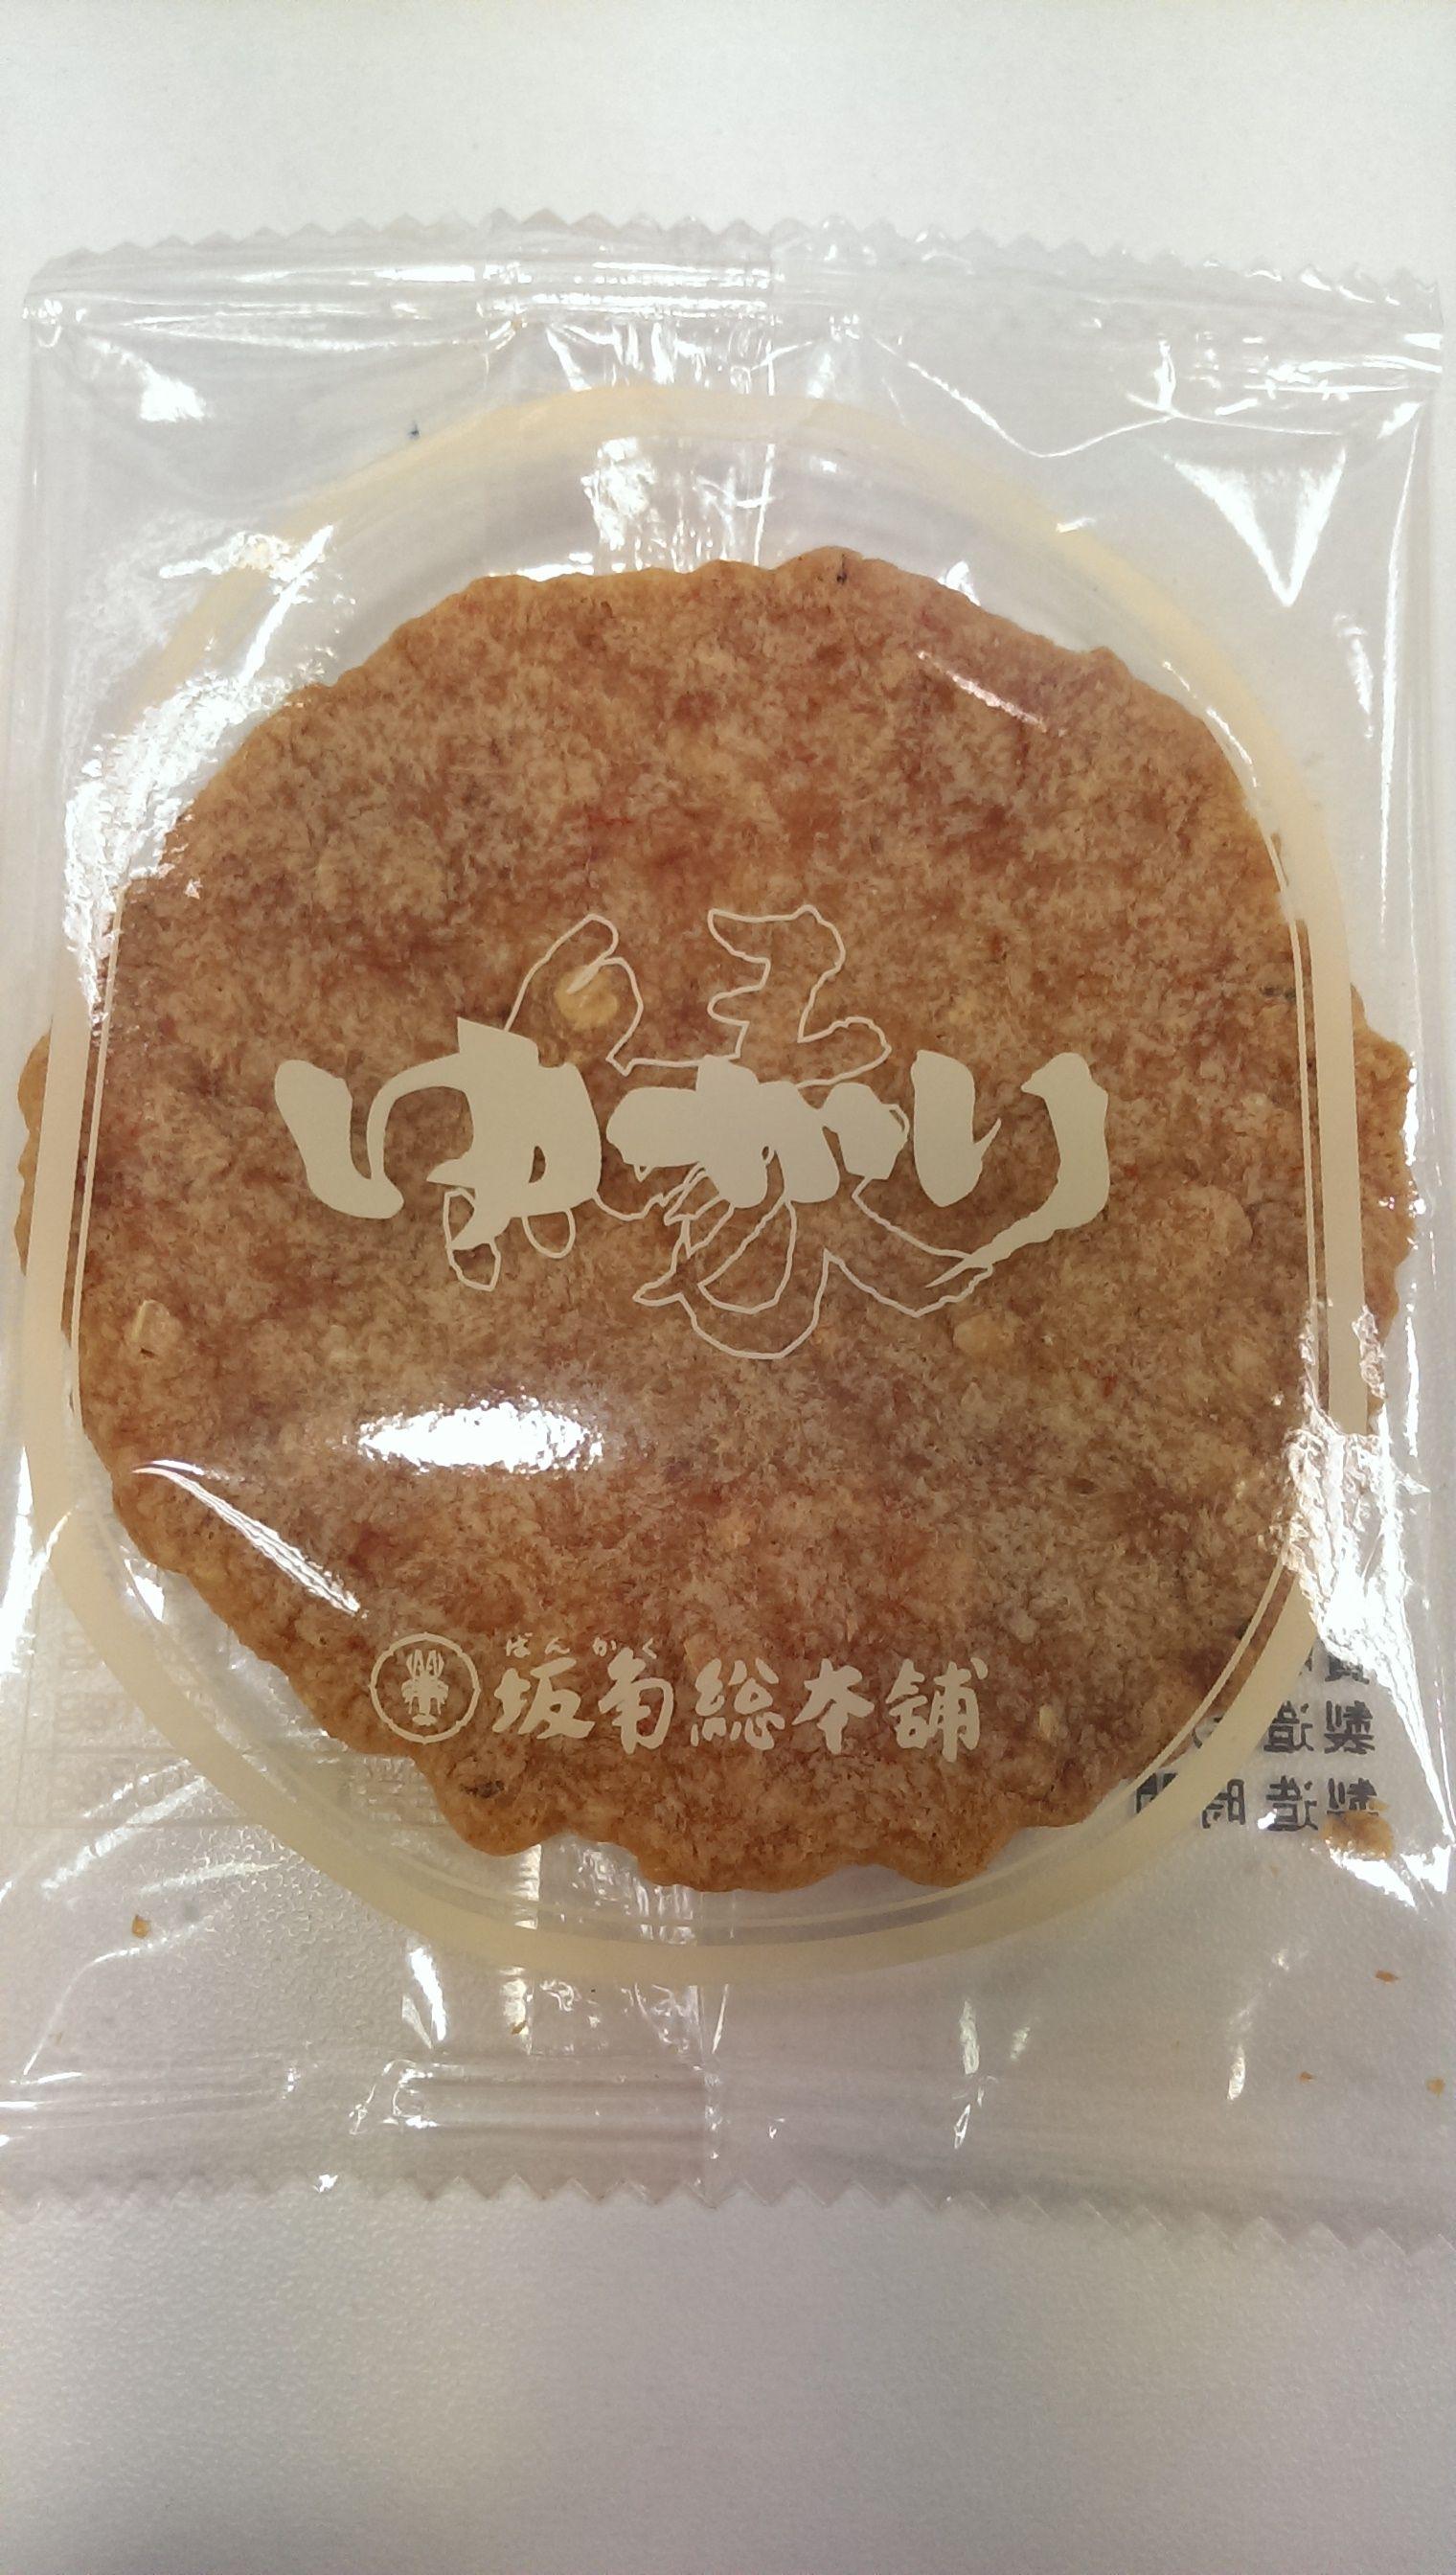 Cuttlefish Crackers japanese snack Yummy Stuffs